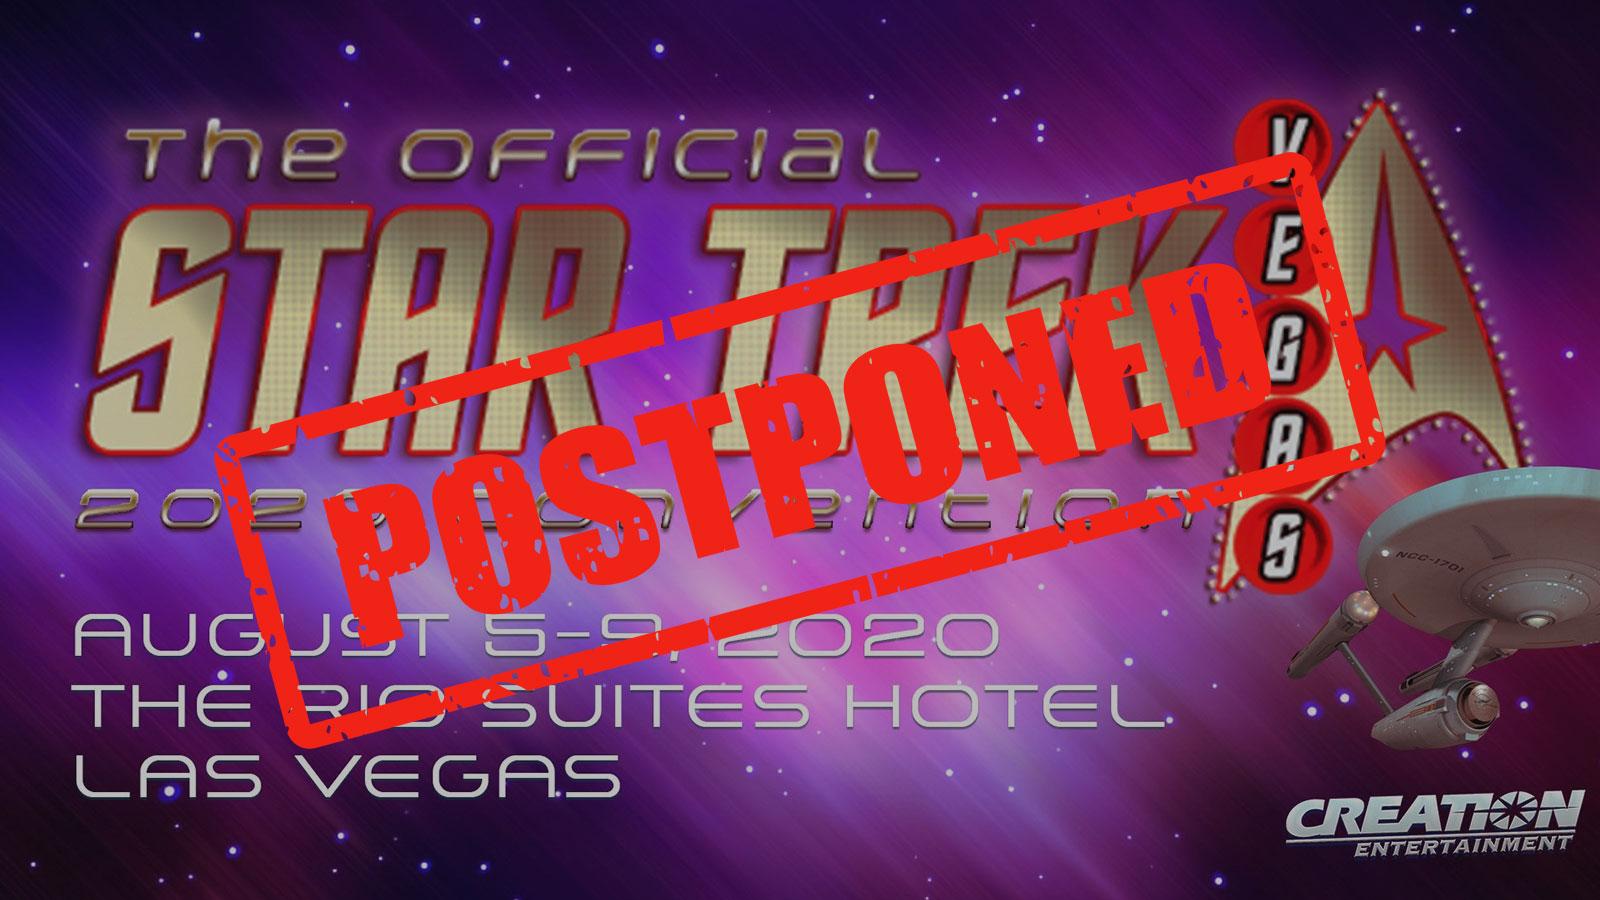 STAR TREK LAS VEGAS 2020 Postponed, New Dates And Location Announced